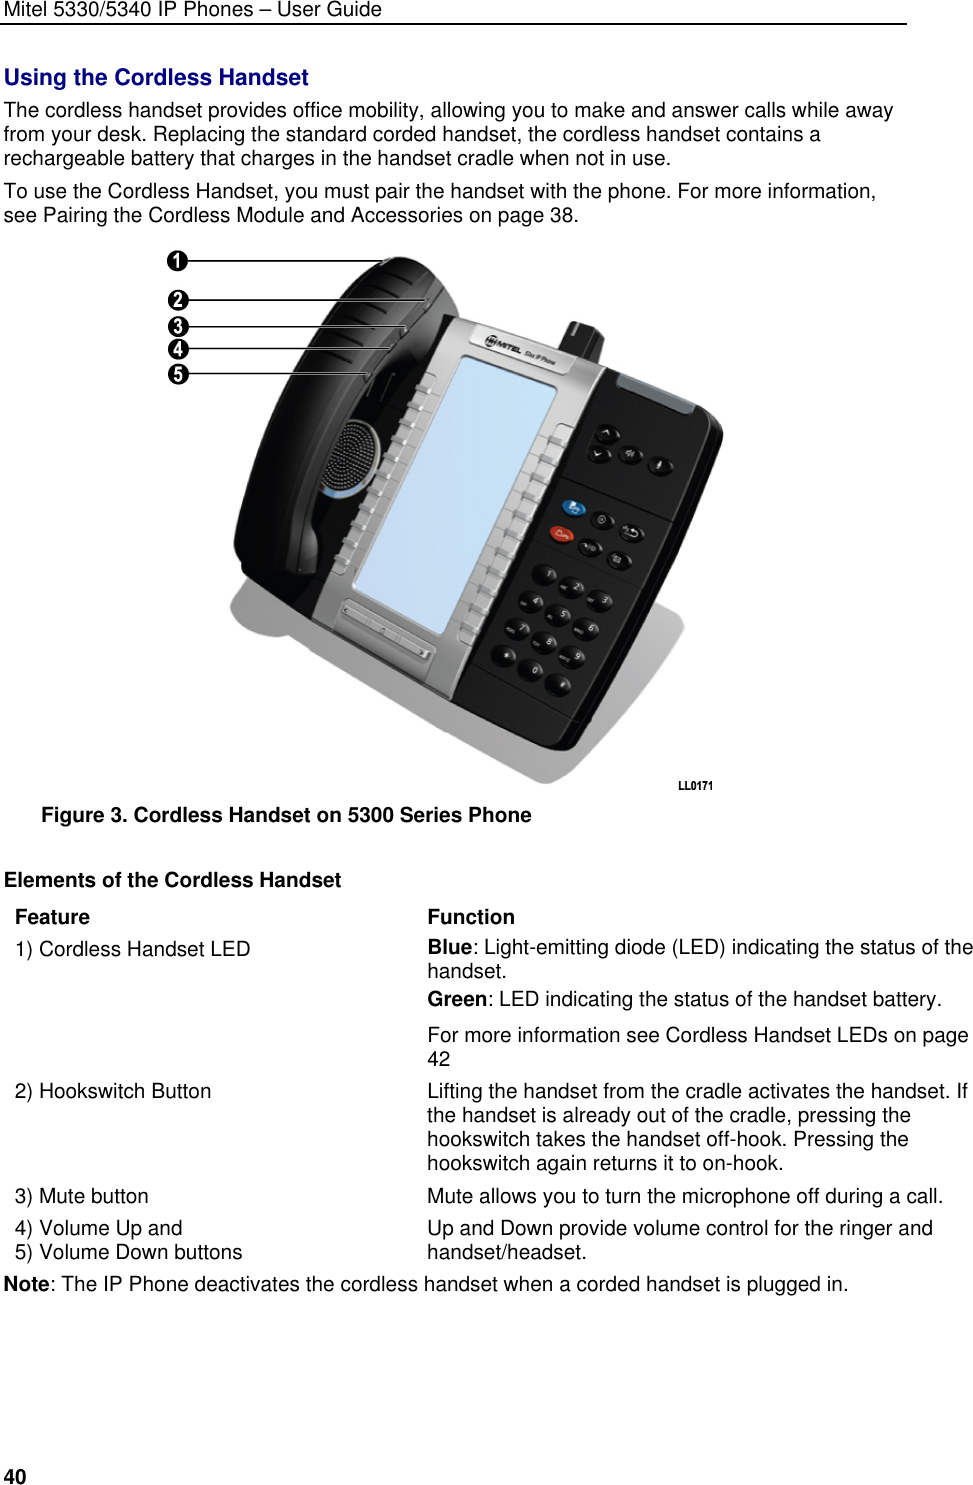 Mitel Phone Accessories